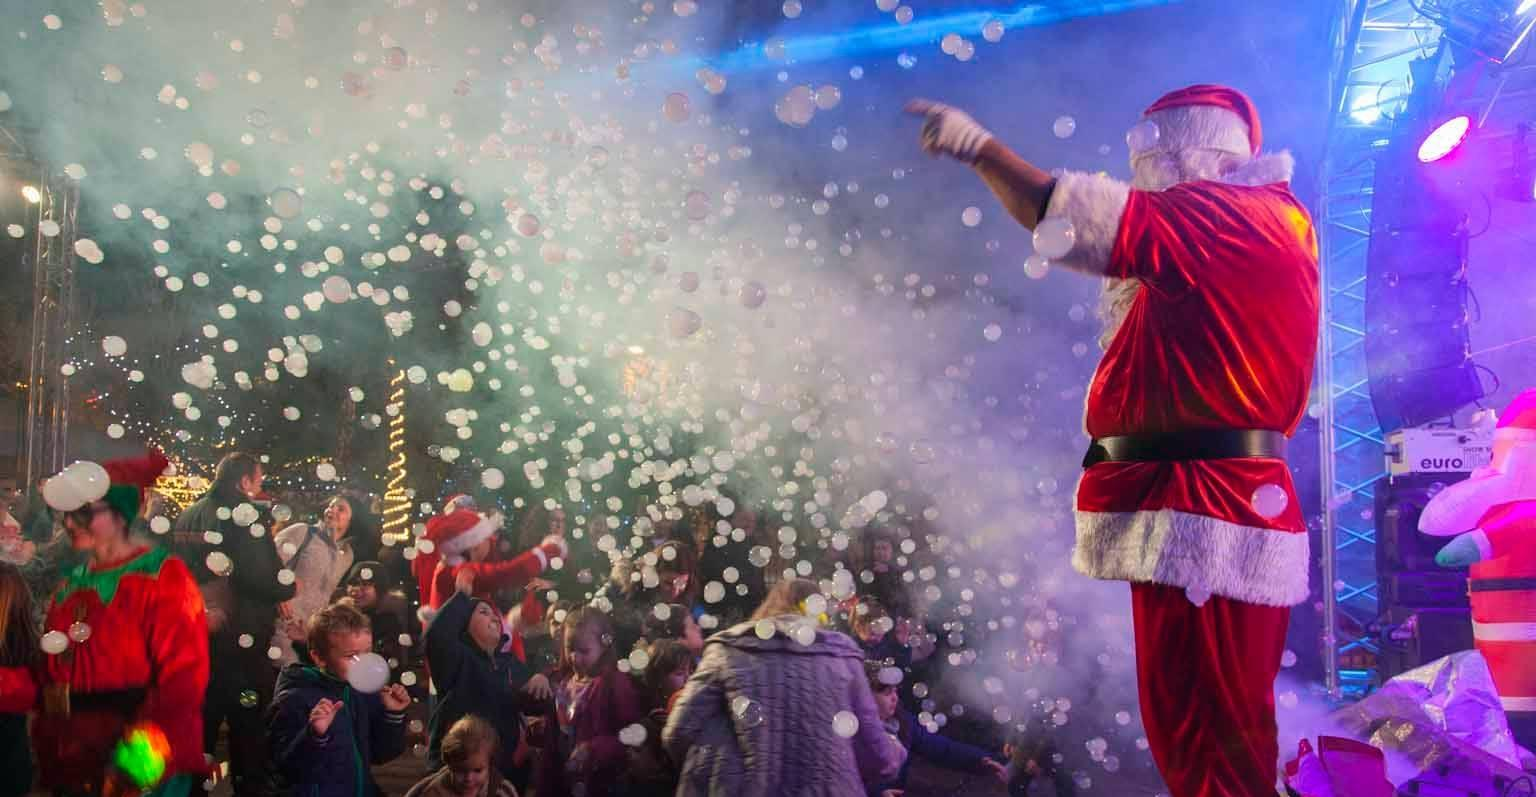 Adventura Šibenik: Fun and winter ambient spirit in Christmastime